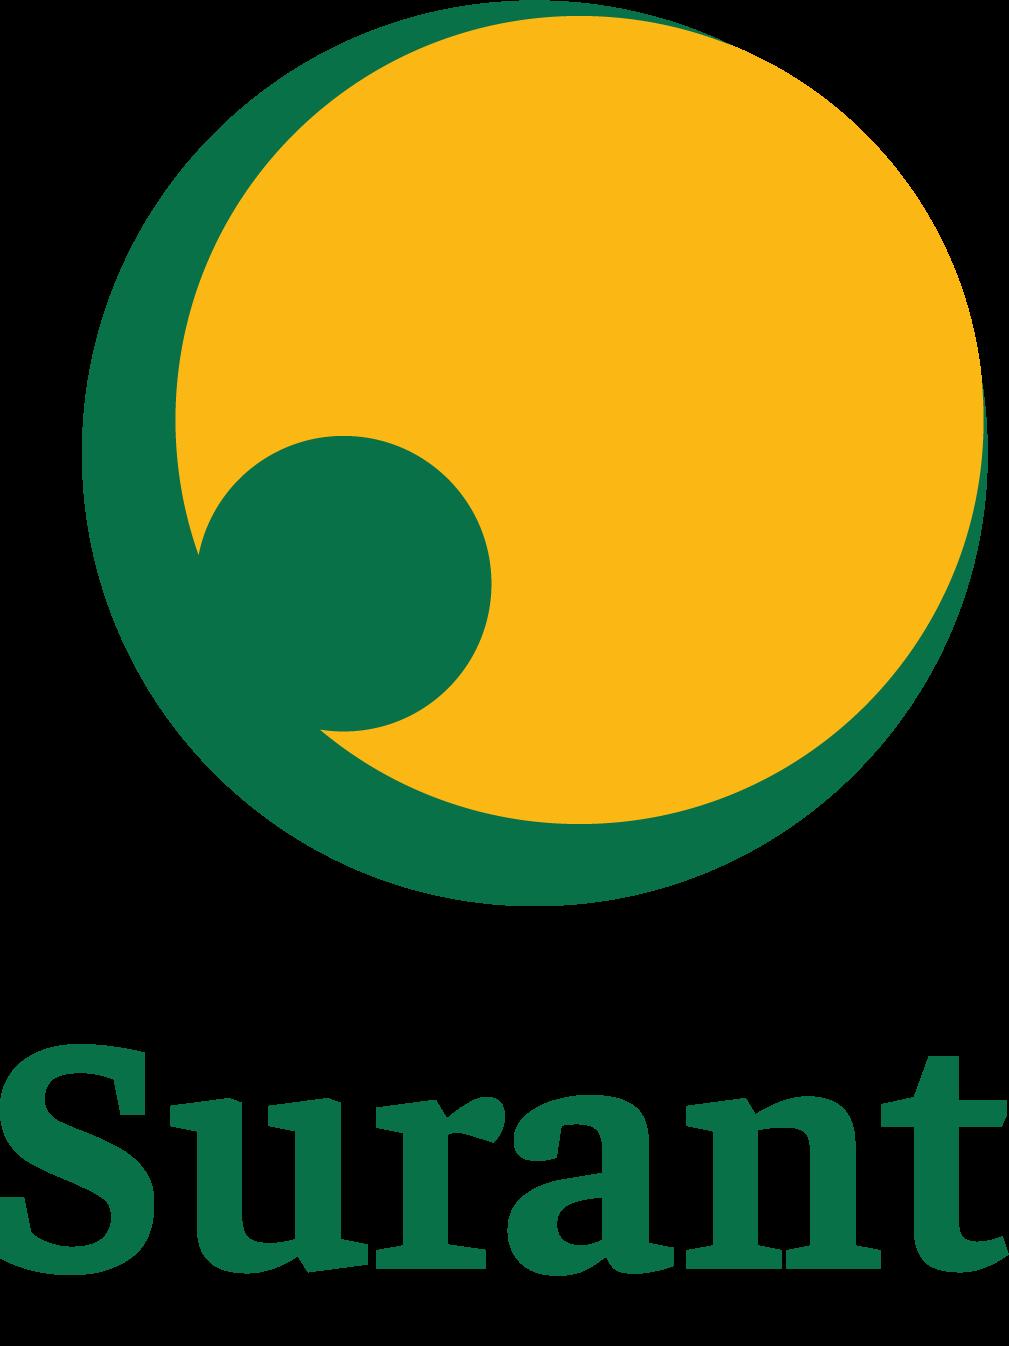 Stichting Surant